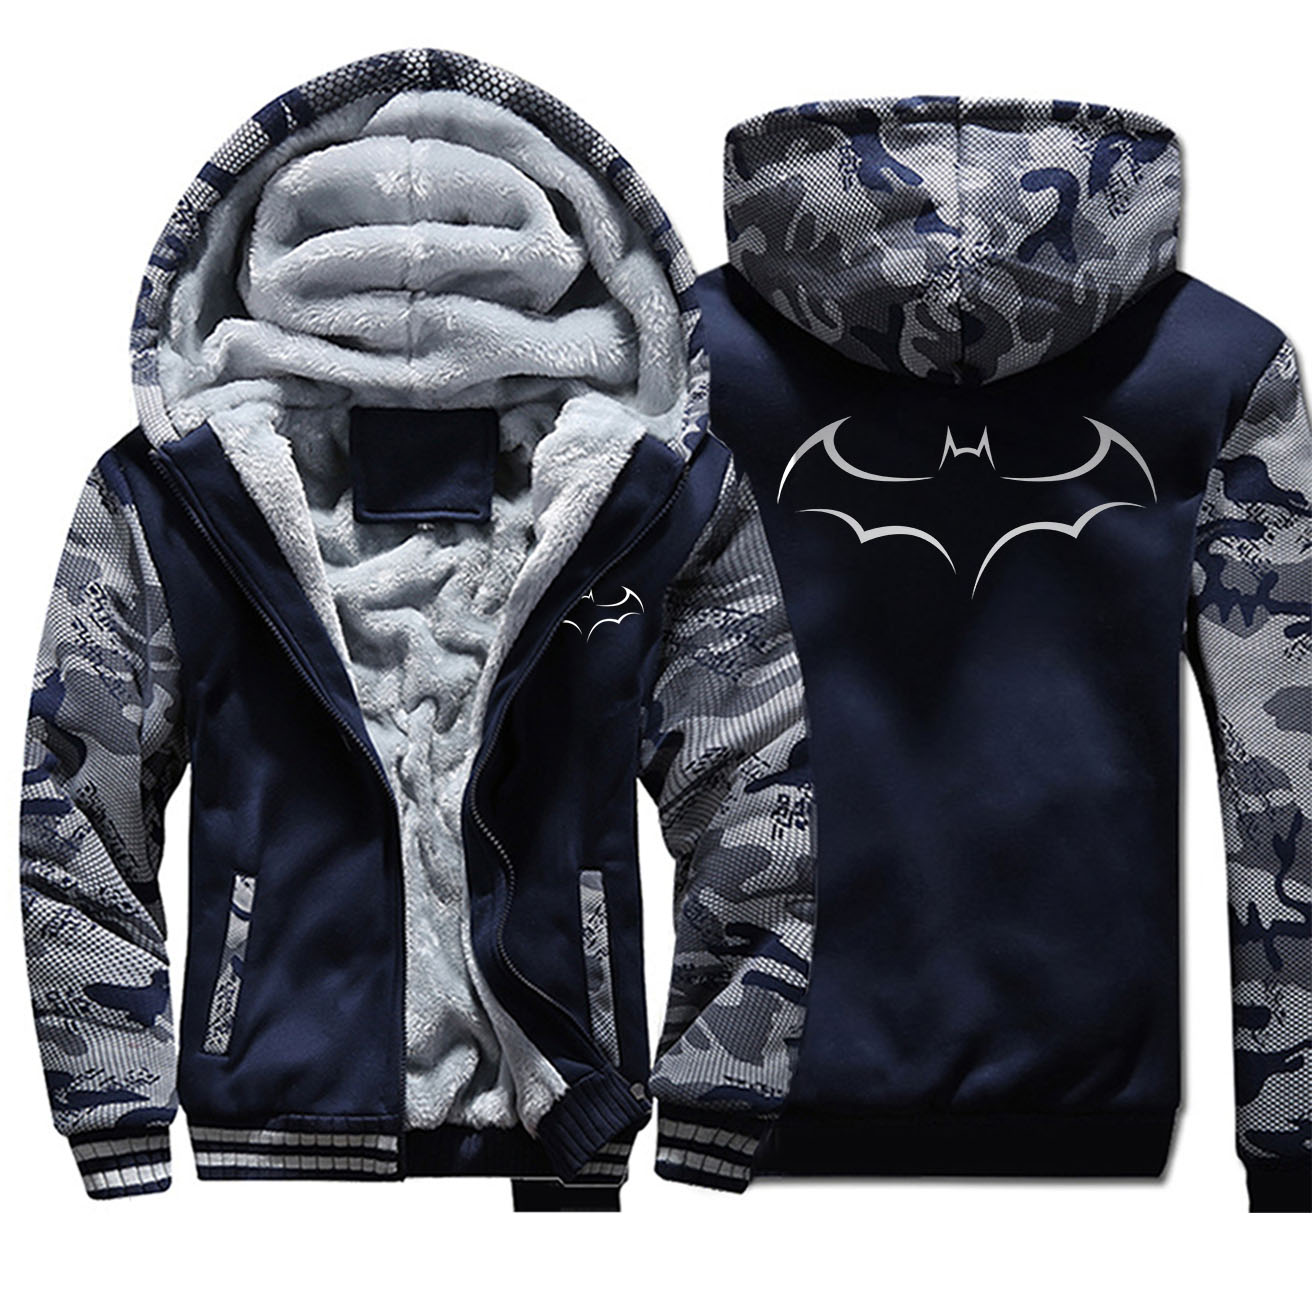 Batman Bruce Wayne Jackets Men Hoodies Superhero Sweatshirts Winter Thick Feece Zipper Coats Sportswear Camo Superhero Plus Size